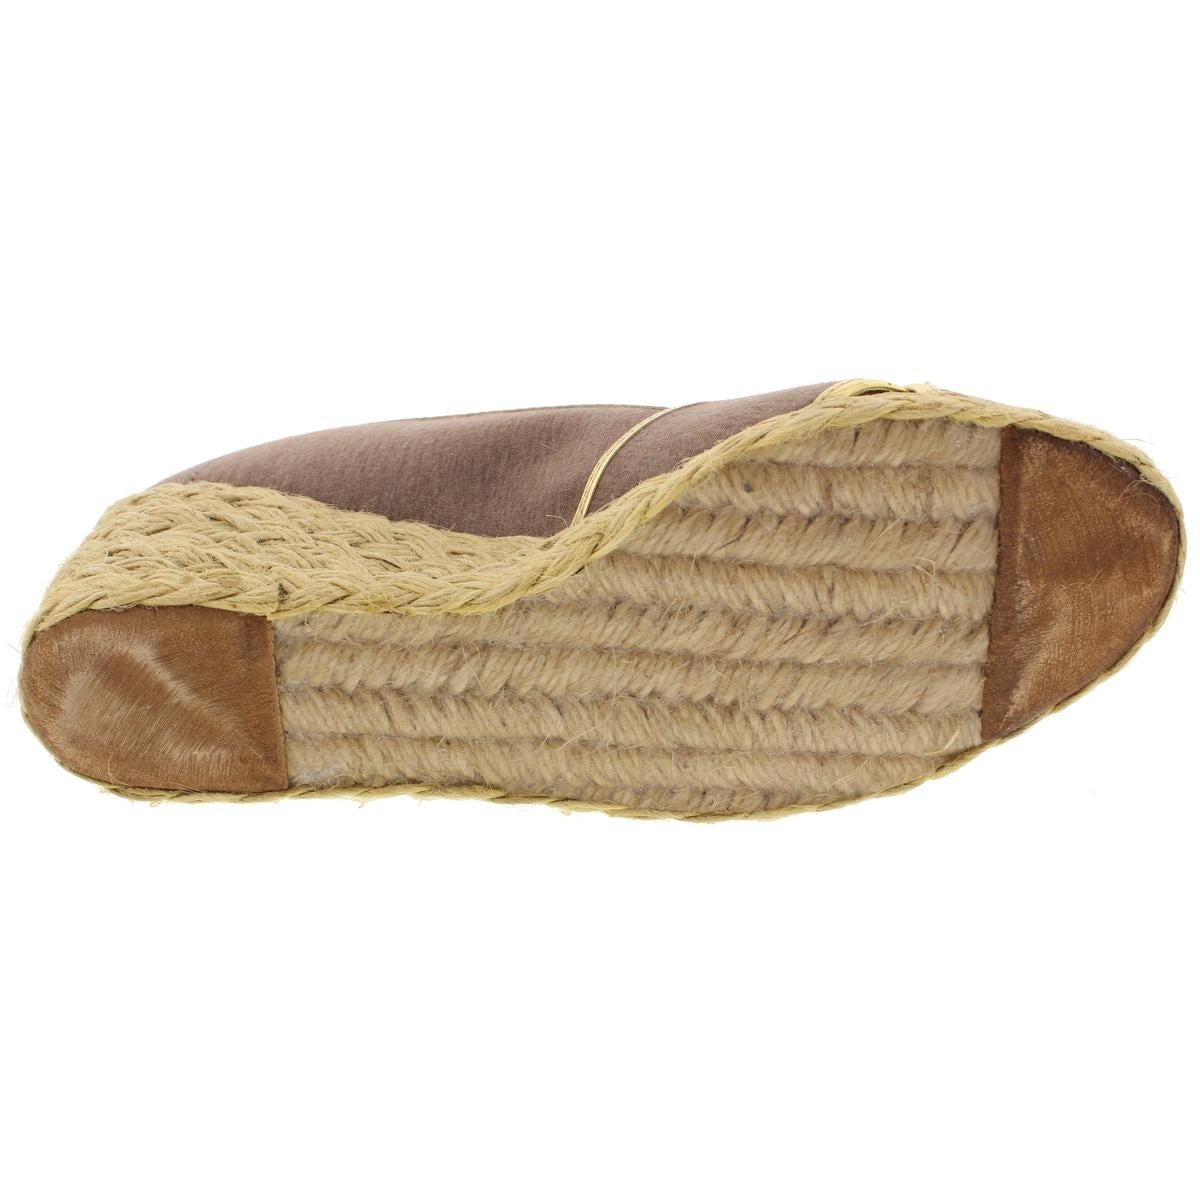 e90ed2a1dc52 Shop Lauren Ralph Lauren Womens Cecilia II Wedge Sandals Espadrille  Metallic Trim - 8.5 medium (b